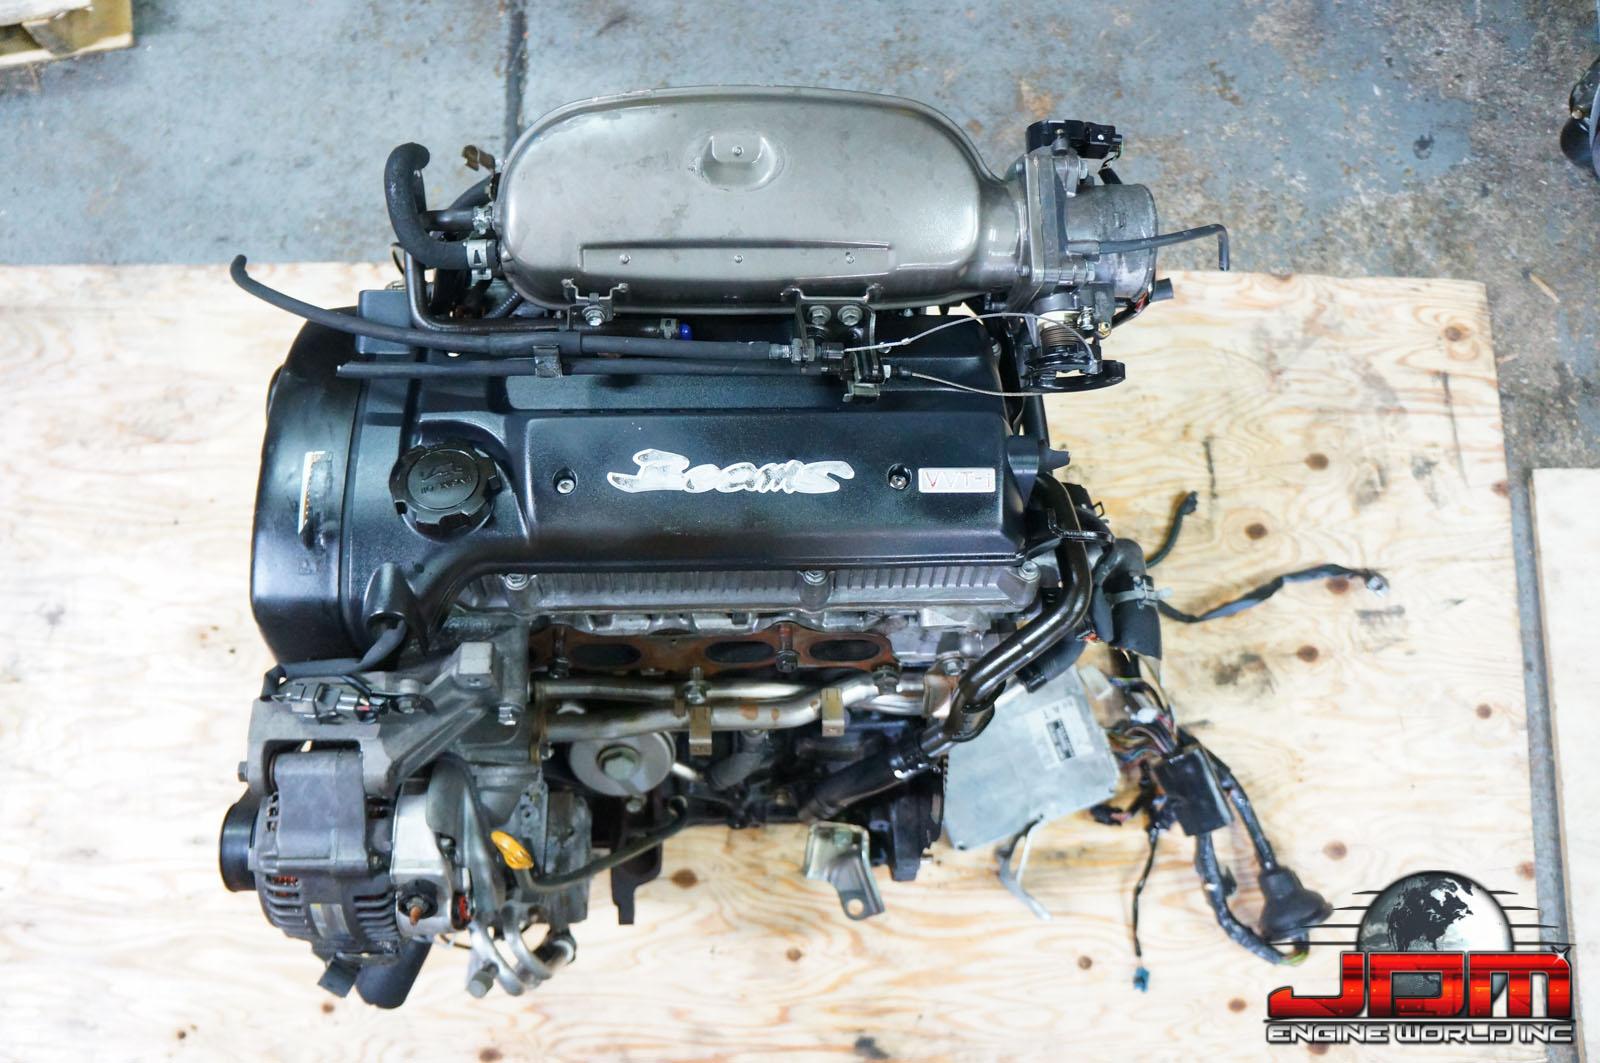 JDM 3S-GE BEAMS VVTI FWD AWD ENGINE ONLY